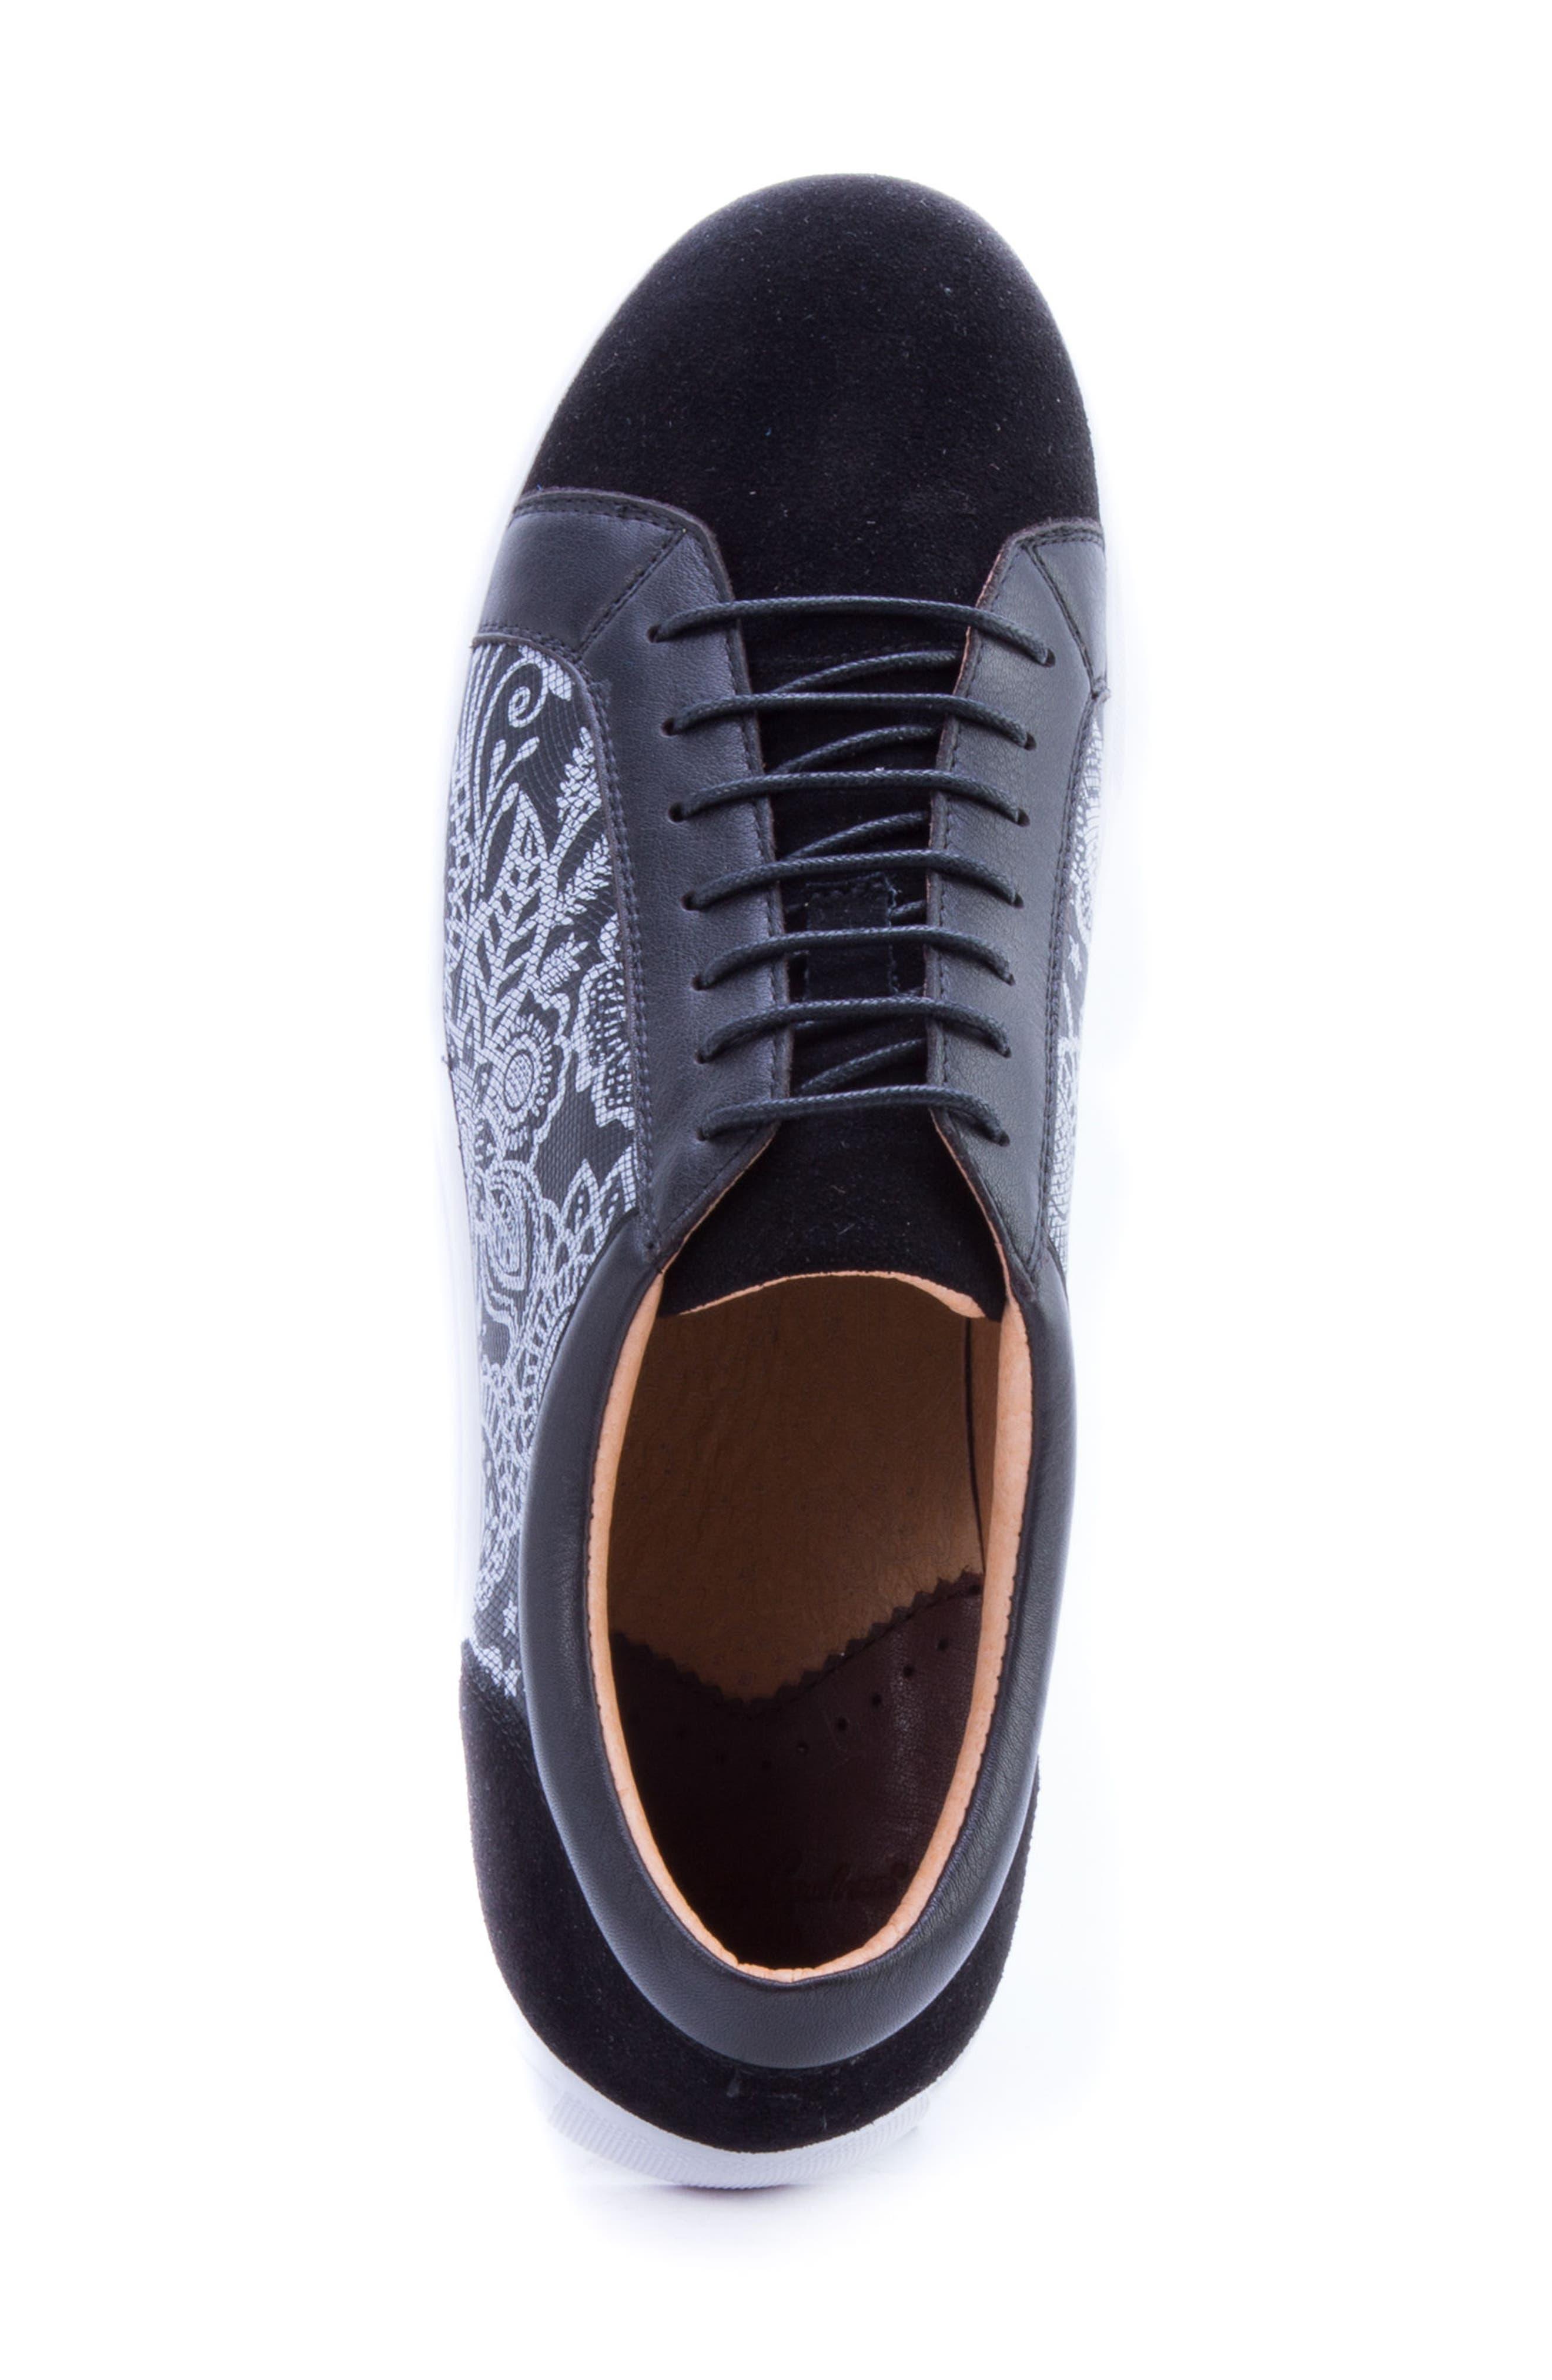 Rubio Floral Sneaker,                             Alternate thumbnail 5, color,                             BLACK SUEDE